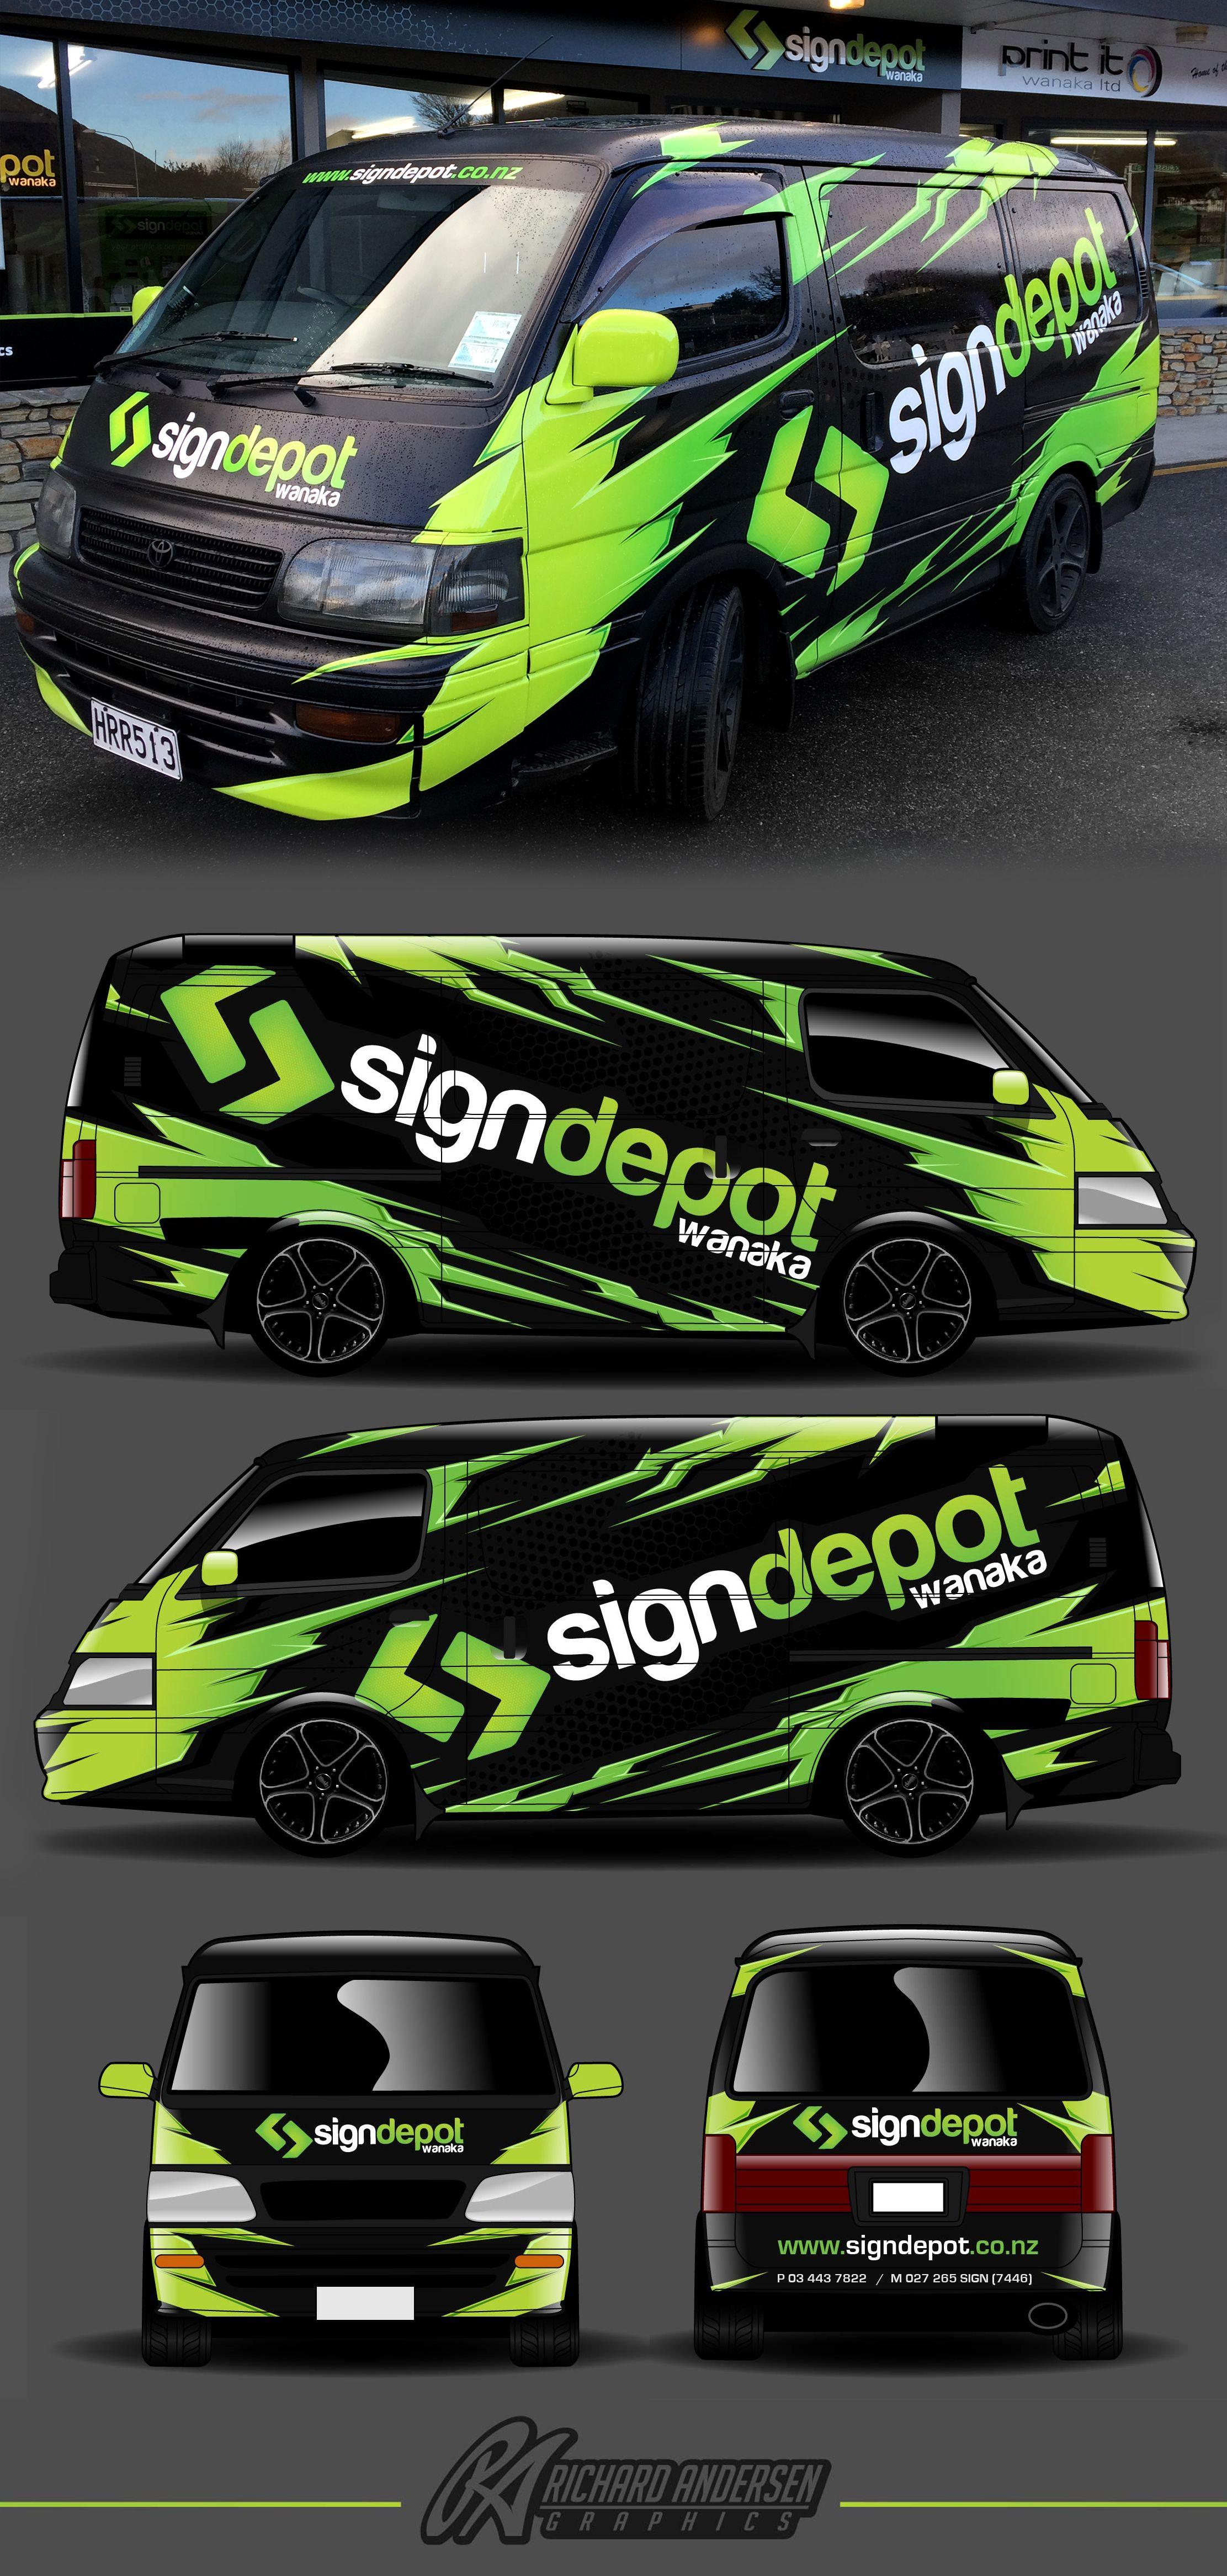 Wrap Design By Richard Andersen Https Ragraphics Carbonmade Com Vehicle Signage Car Wrap Car Wrap Design